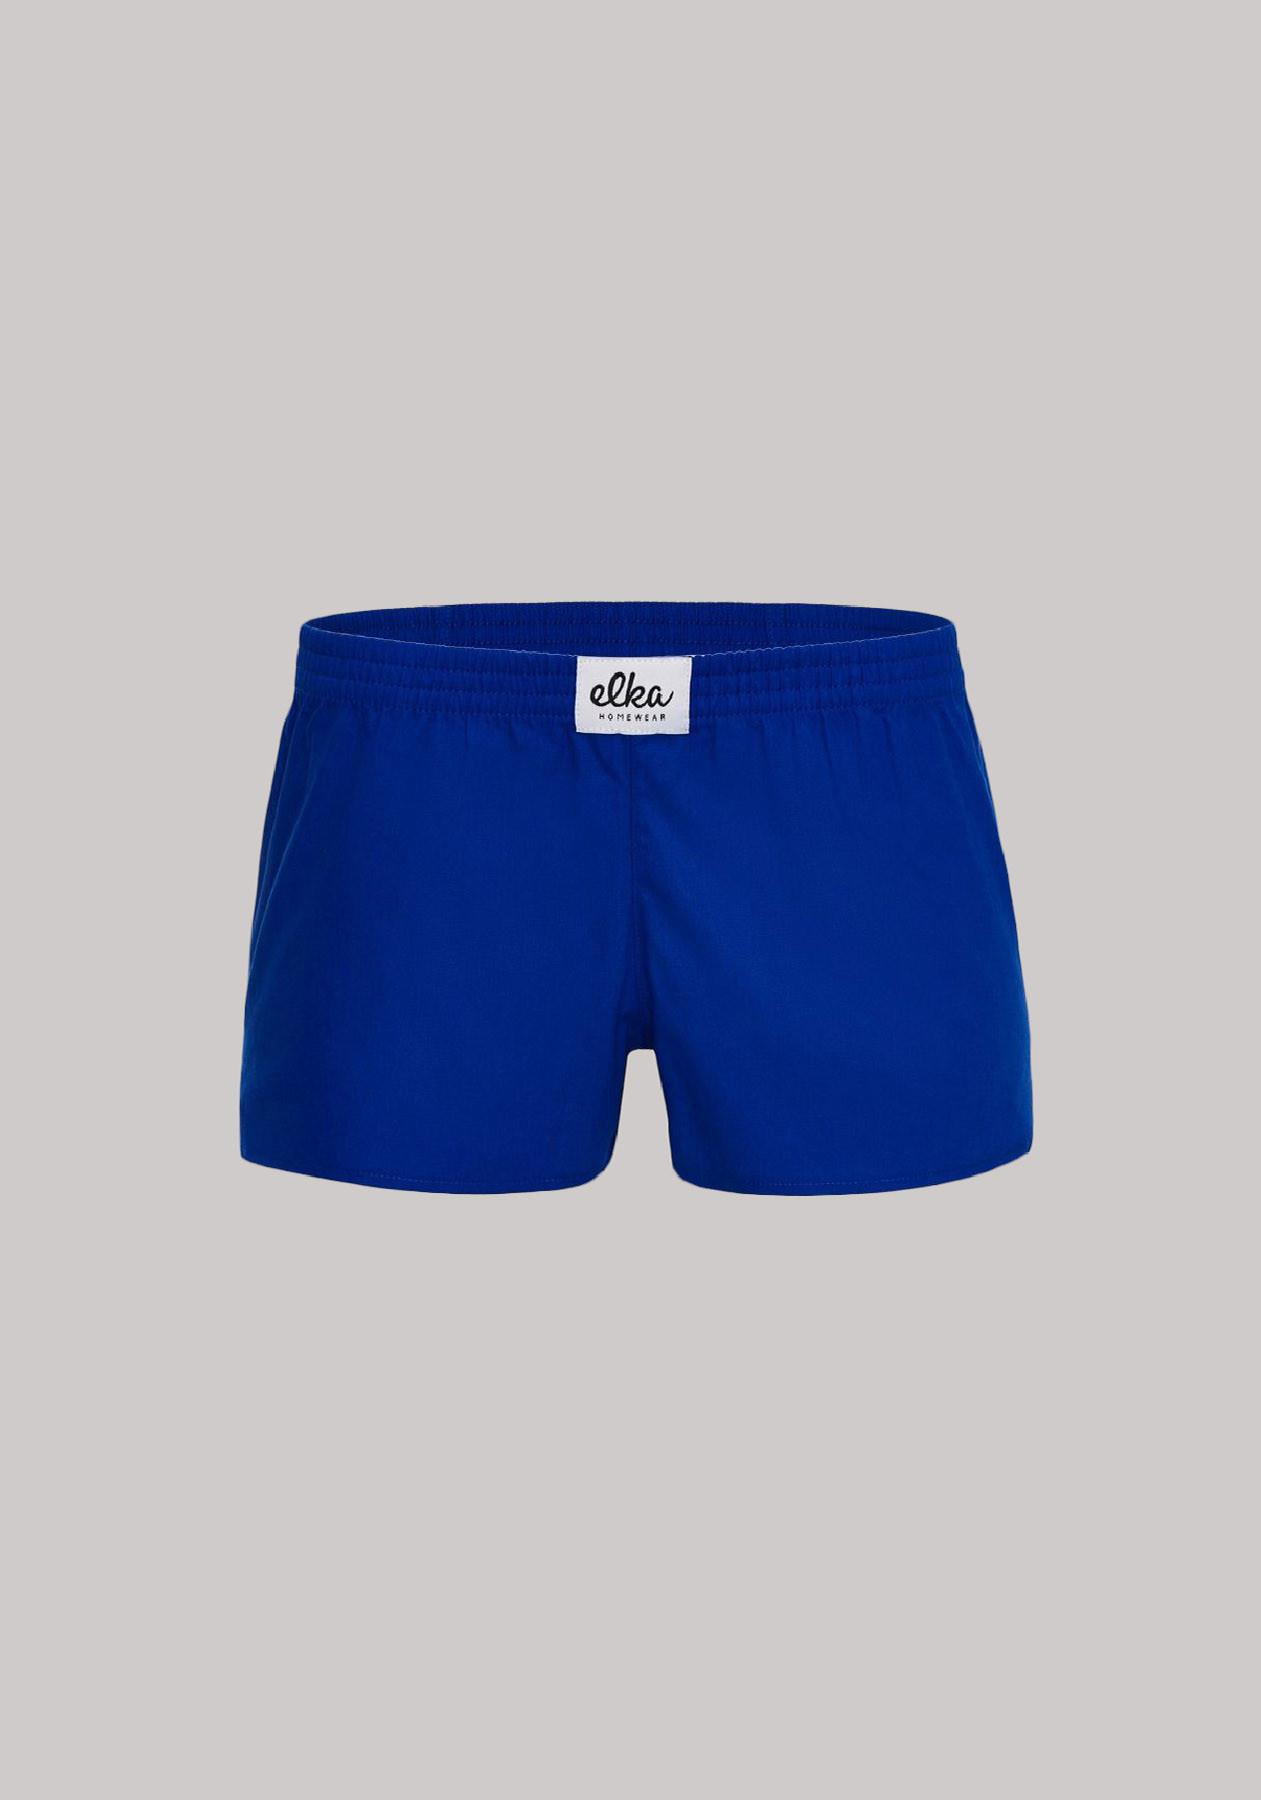 Women-Boxershorts-ELKA-Lounge-W00234